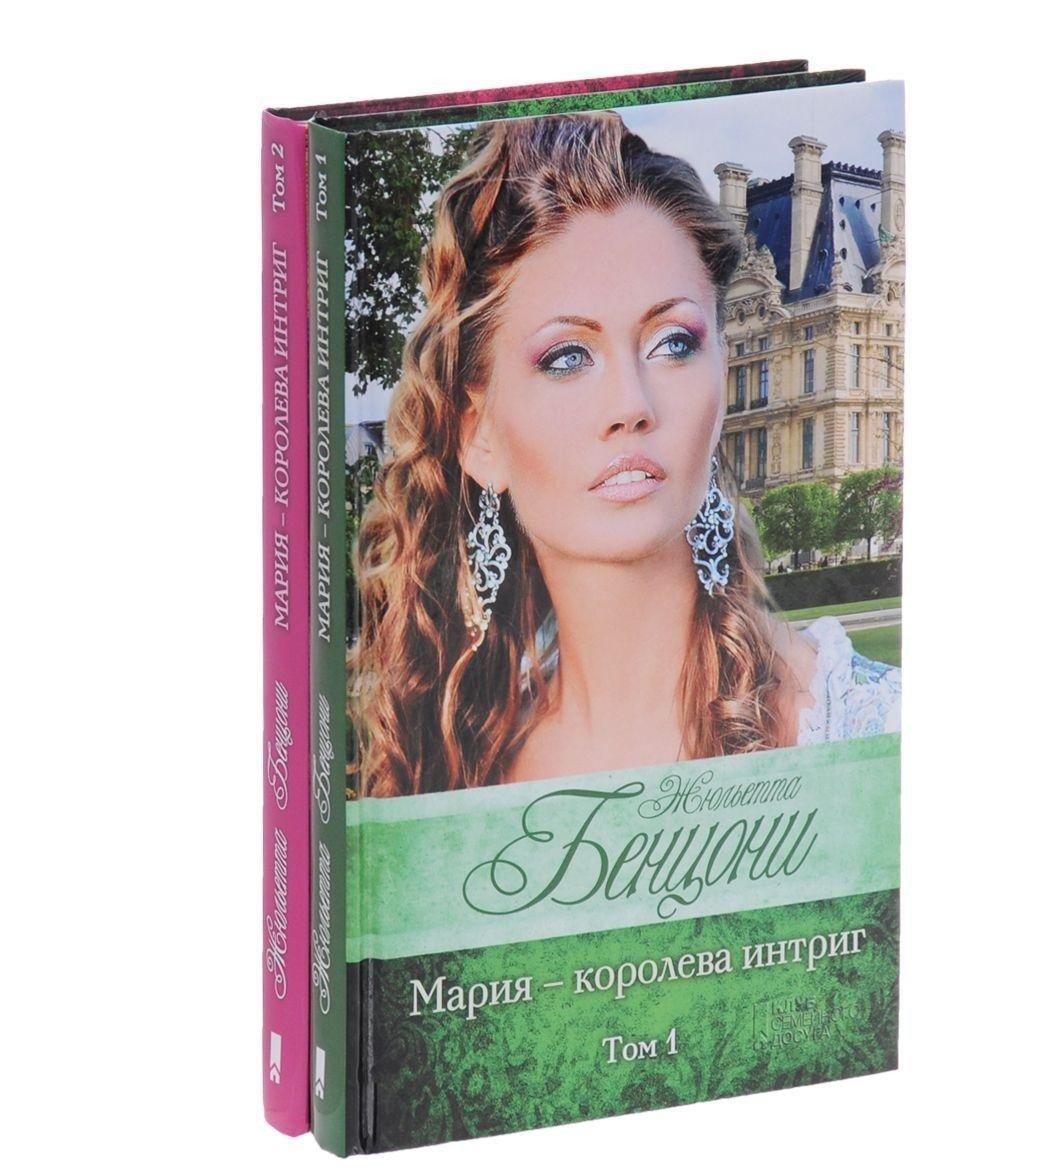 Бенцони Ж. Мария - королева интриг. (комплект) бенцони ж страсти по марии комплект из 2 книг